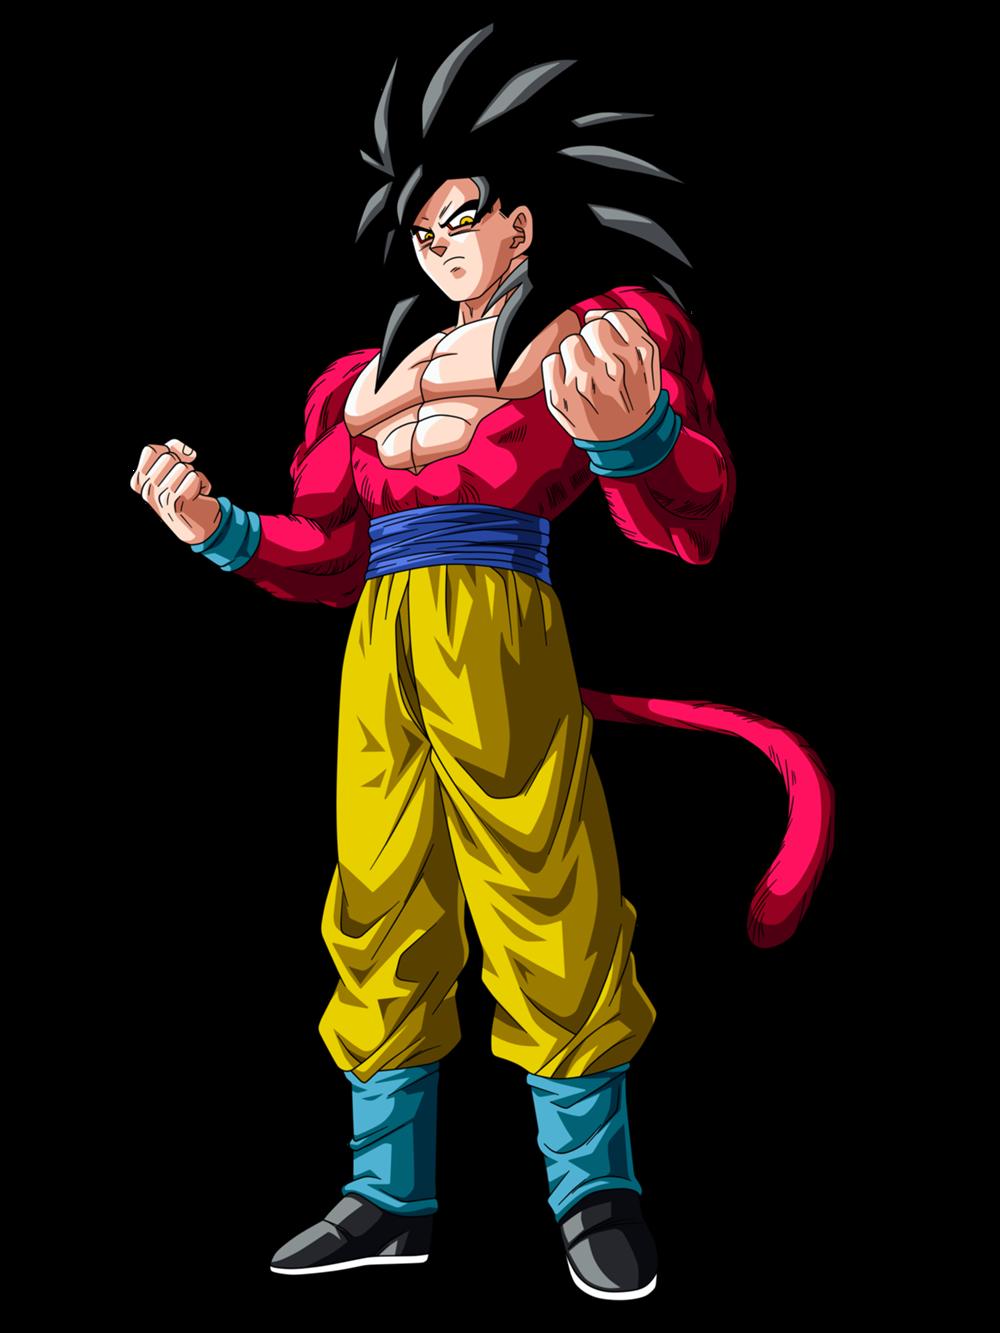 Goku SSJ4.png  sc 1 st  Dragon Ball Universe - Fandom & Image - Goku SSJ4.png | Dragon Ball Universe | FANDOM powered by Wikia